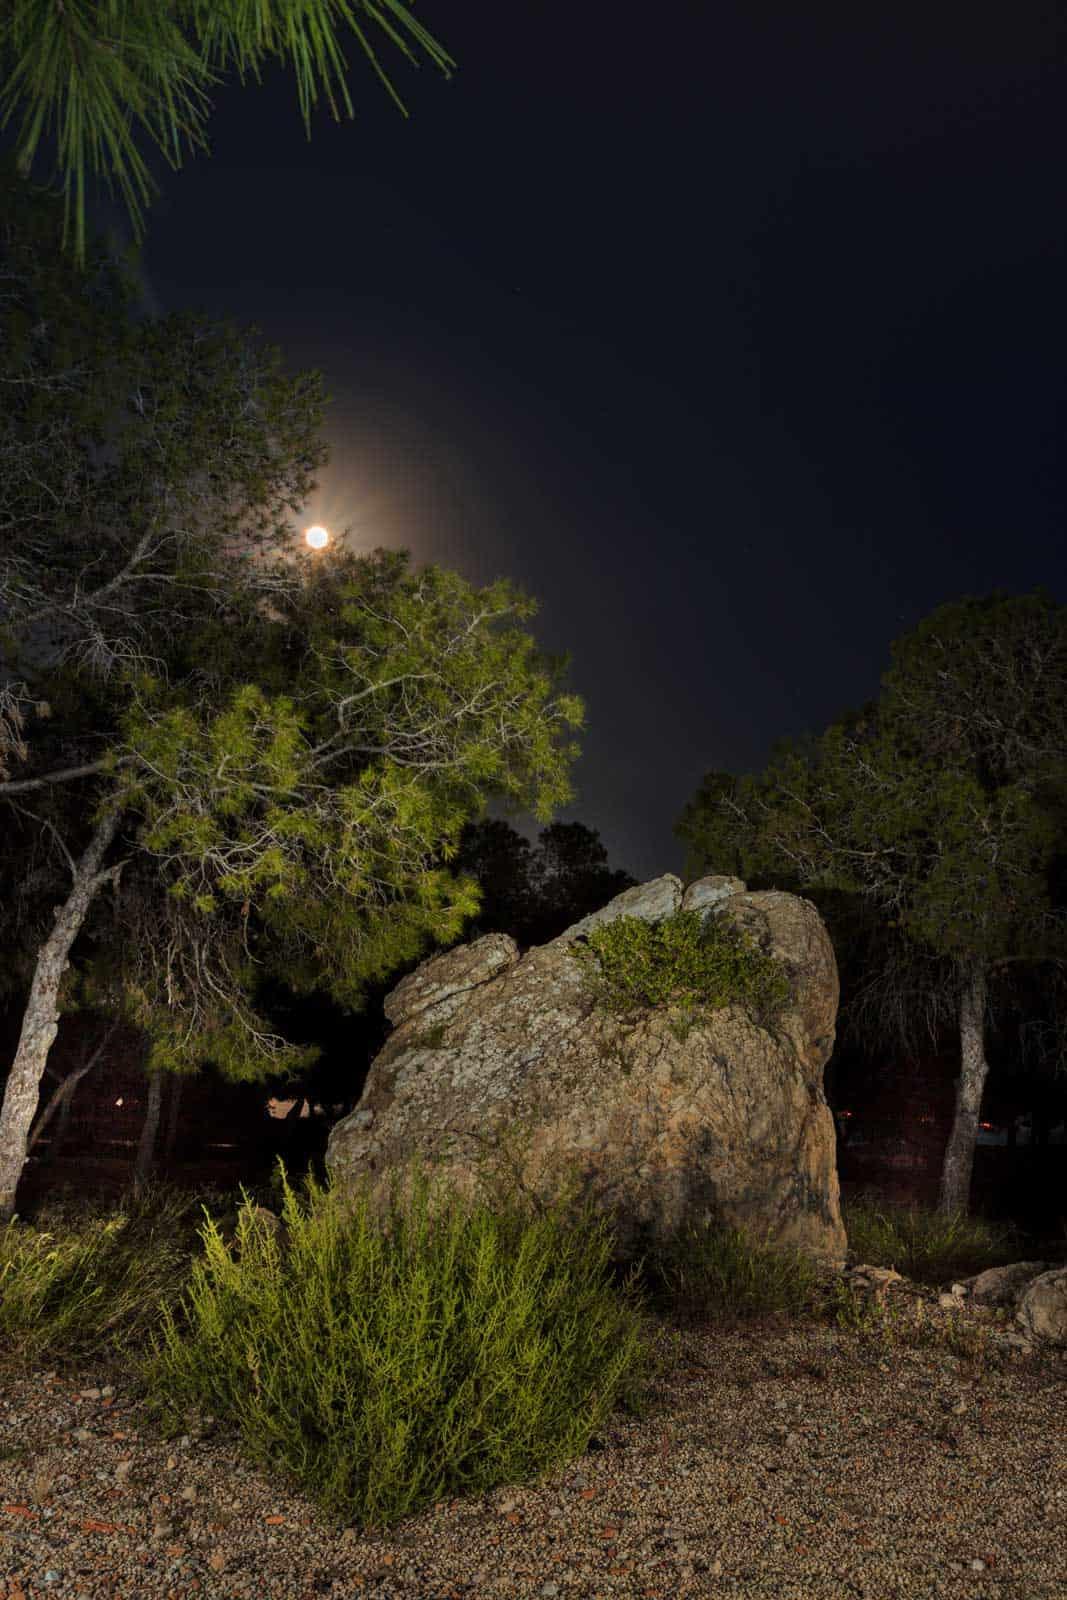 1526111459_280418-ouerto-piedras-0032